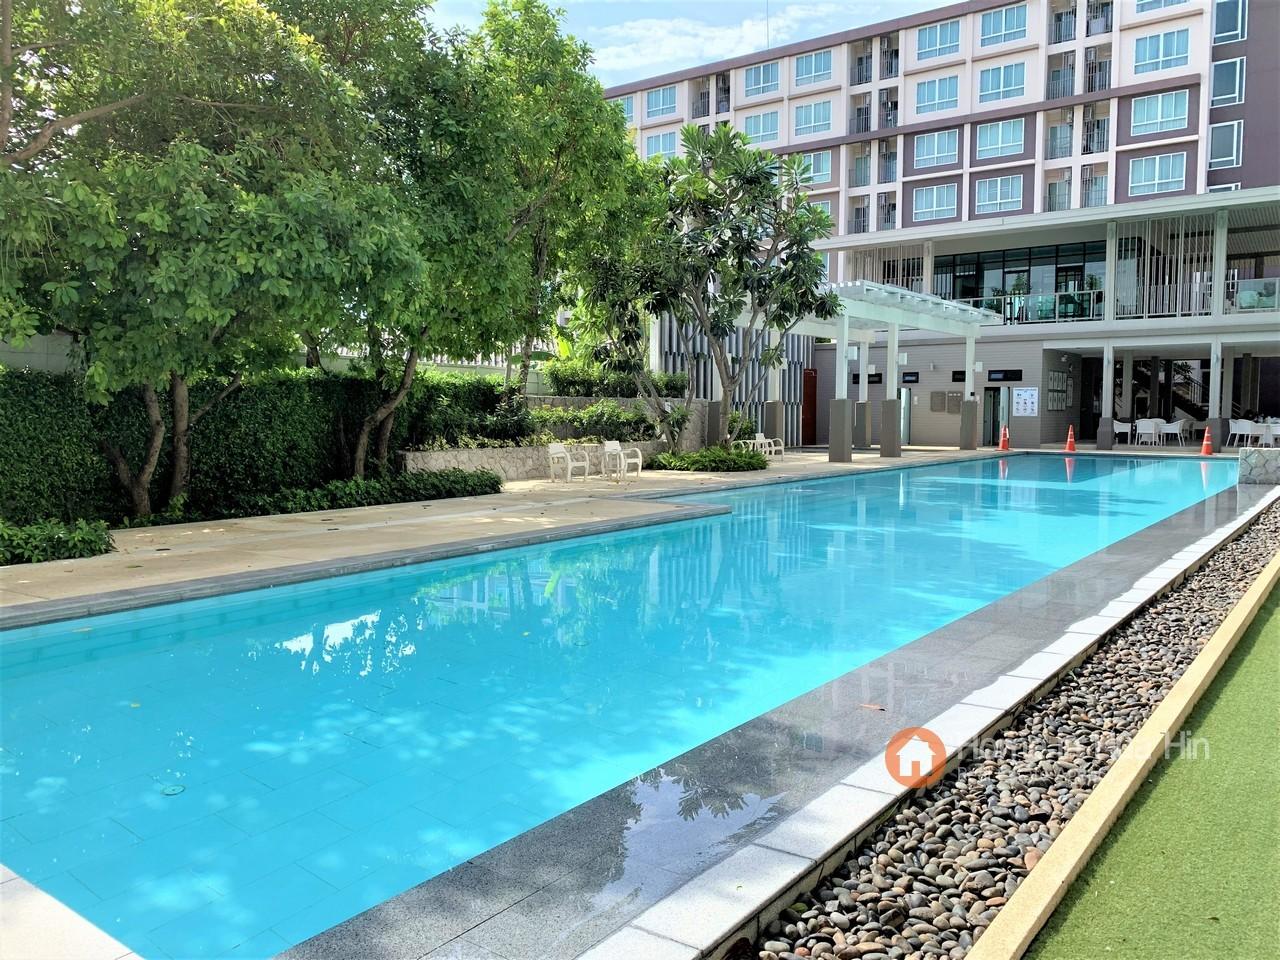 Hua Hin Condo for Sale Hua Hin Beach Apartment